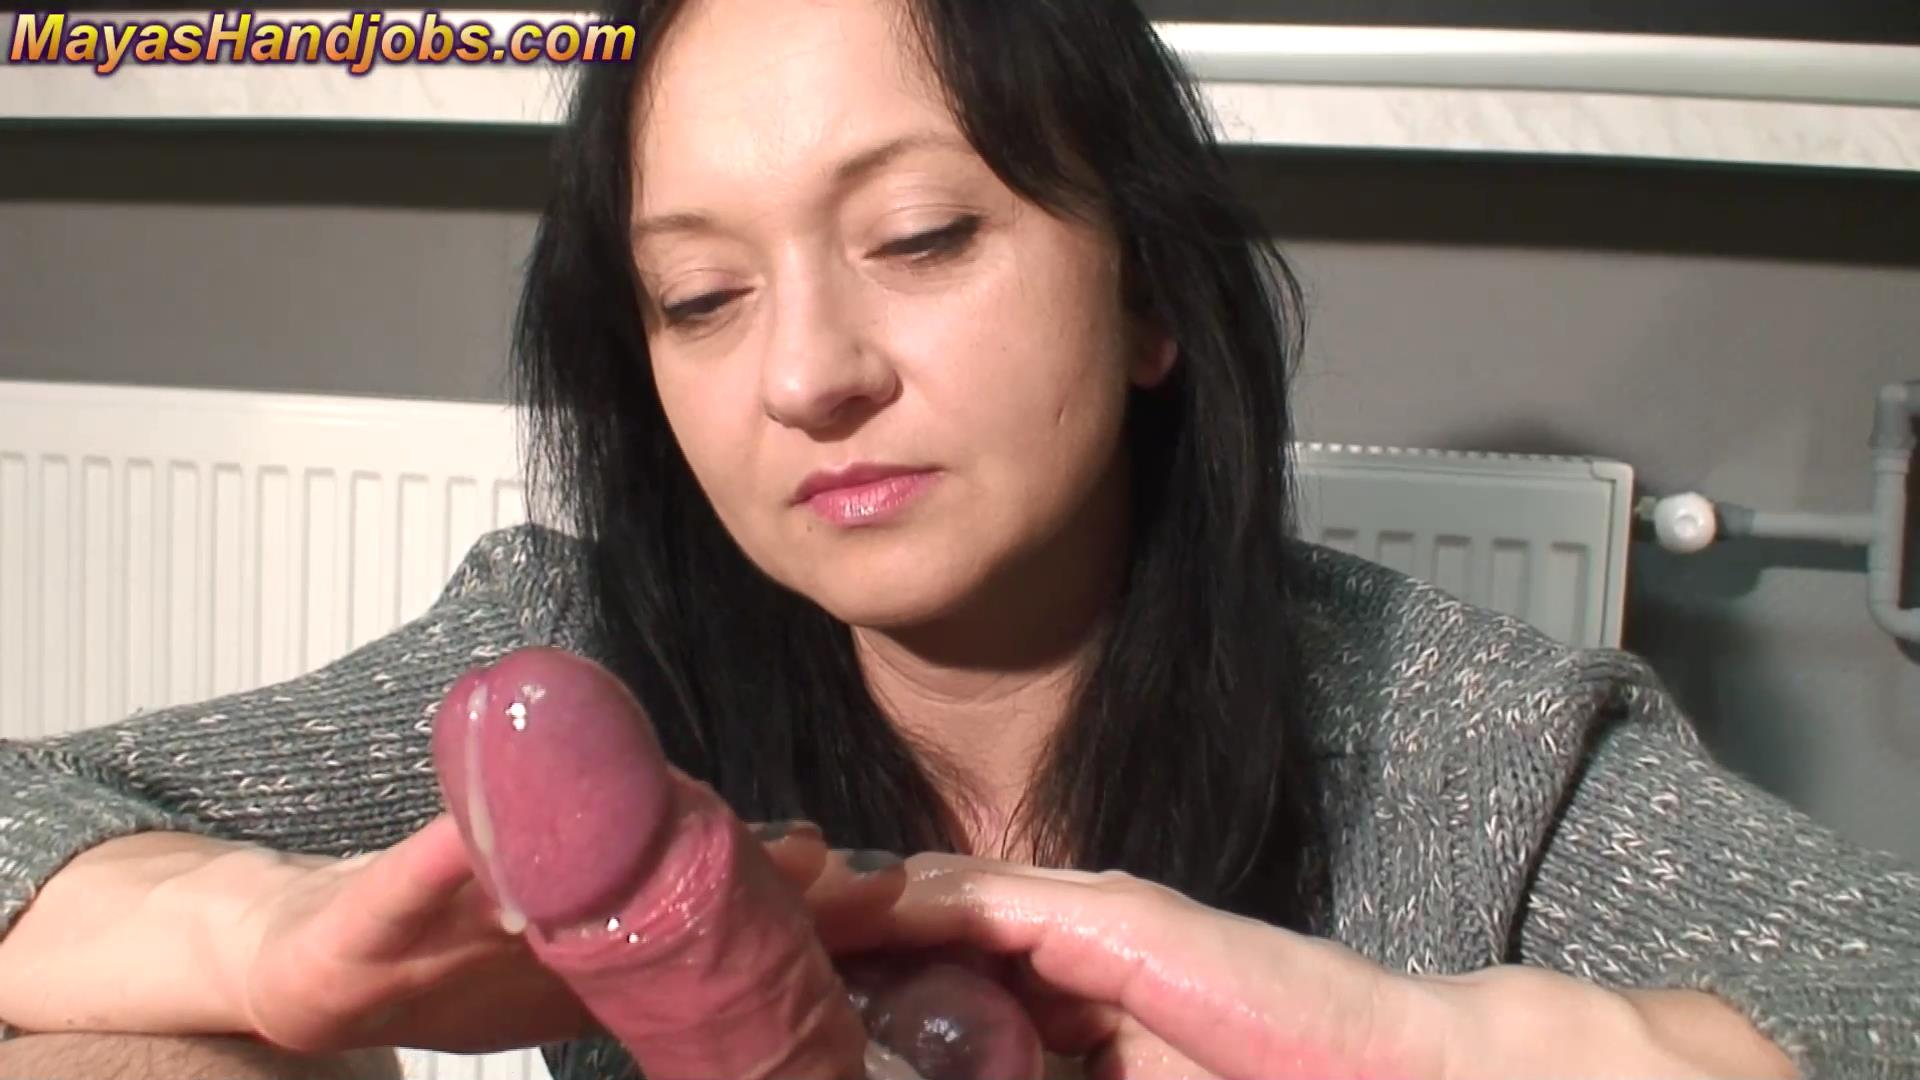 Mistress Maya In Scene: Slow and sensitive cock jerking and licking - 2 cumshots - MAYASHANDJOBS - FULL HD/1080p/MP4